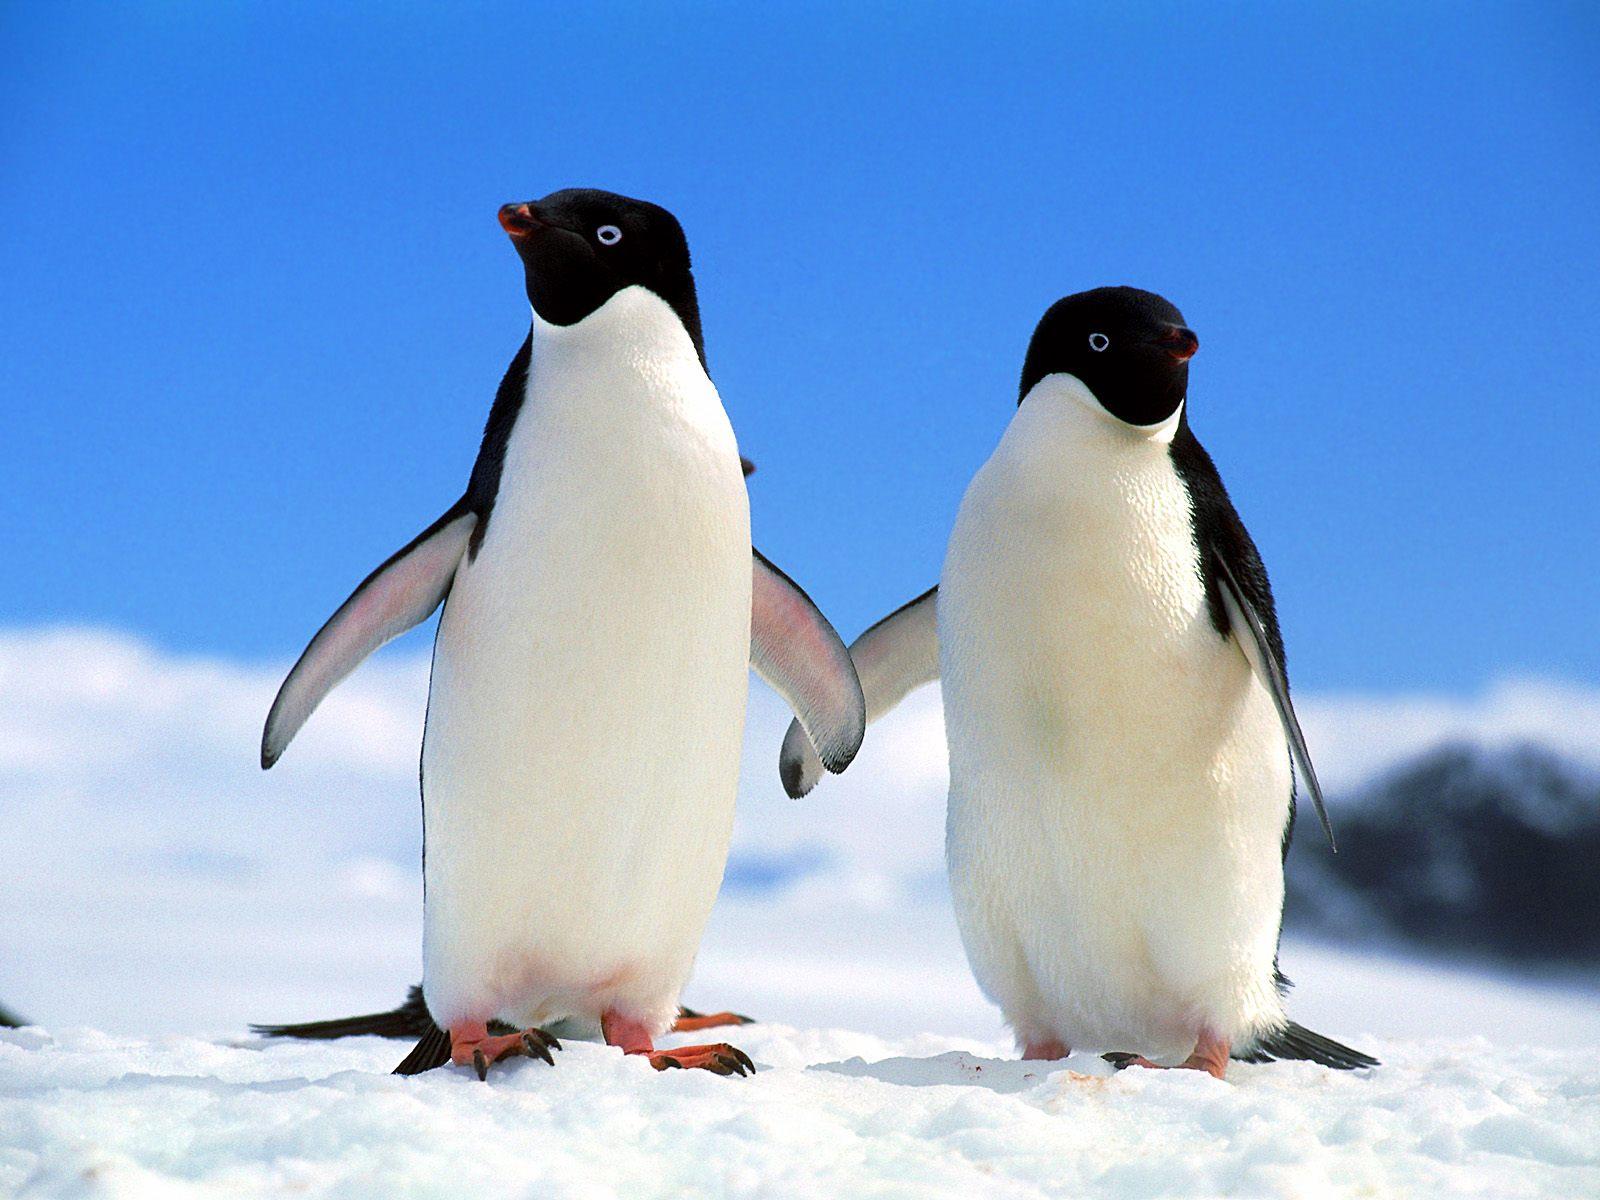 http://1.bp.blogspot.com/-Z-CDI3l-Pmo/Tz3pf3zZUhI/AAAAAAAABvI/61lfilG-2XE/s1600/relationship-love-advice.jpg